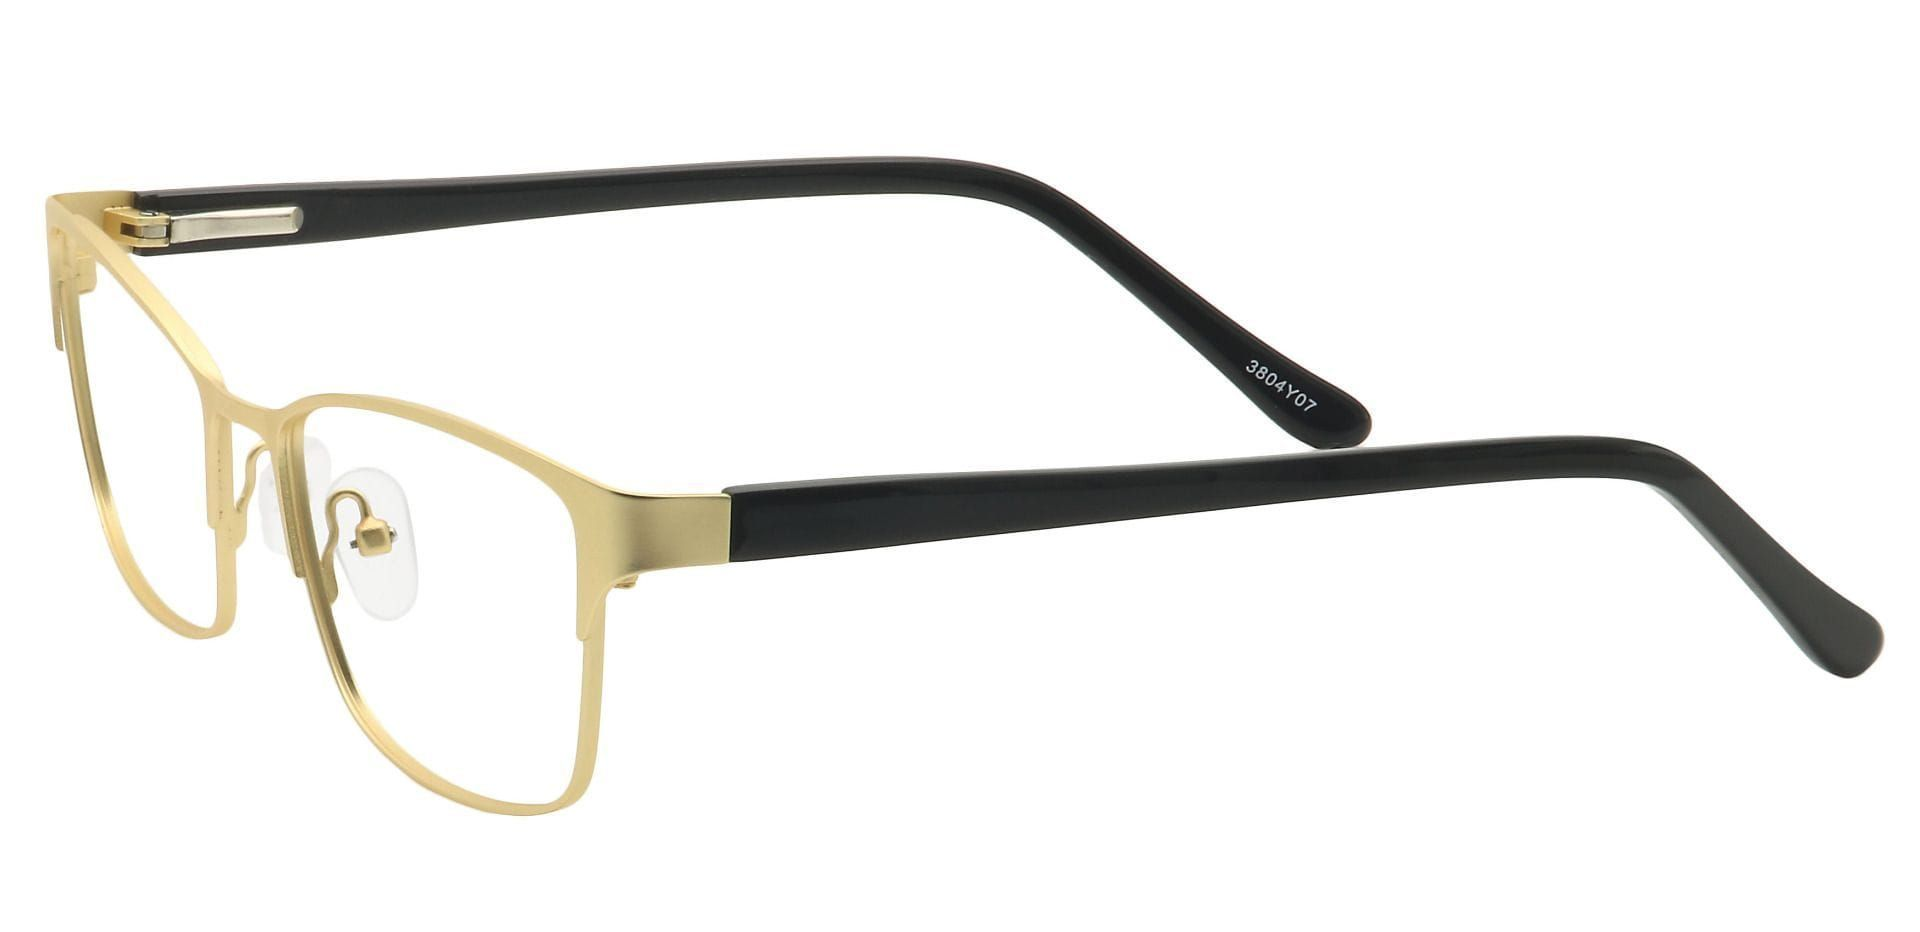 Tella Rectangle Eyeglasses Frame - Yellow